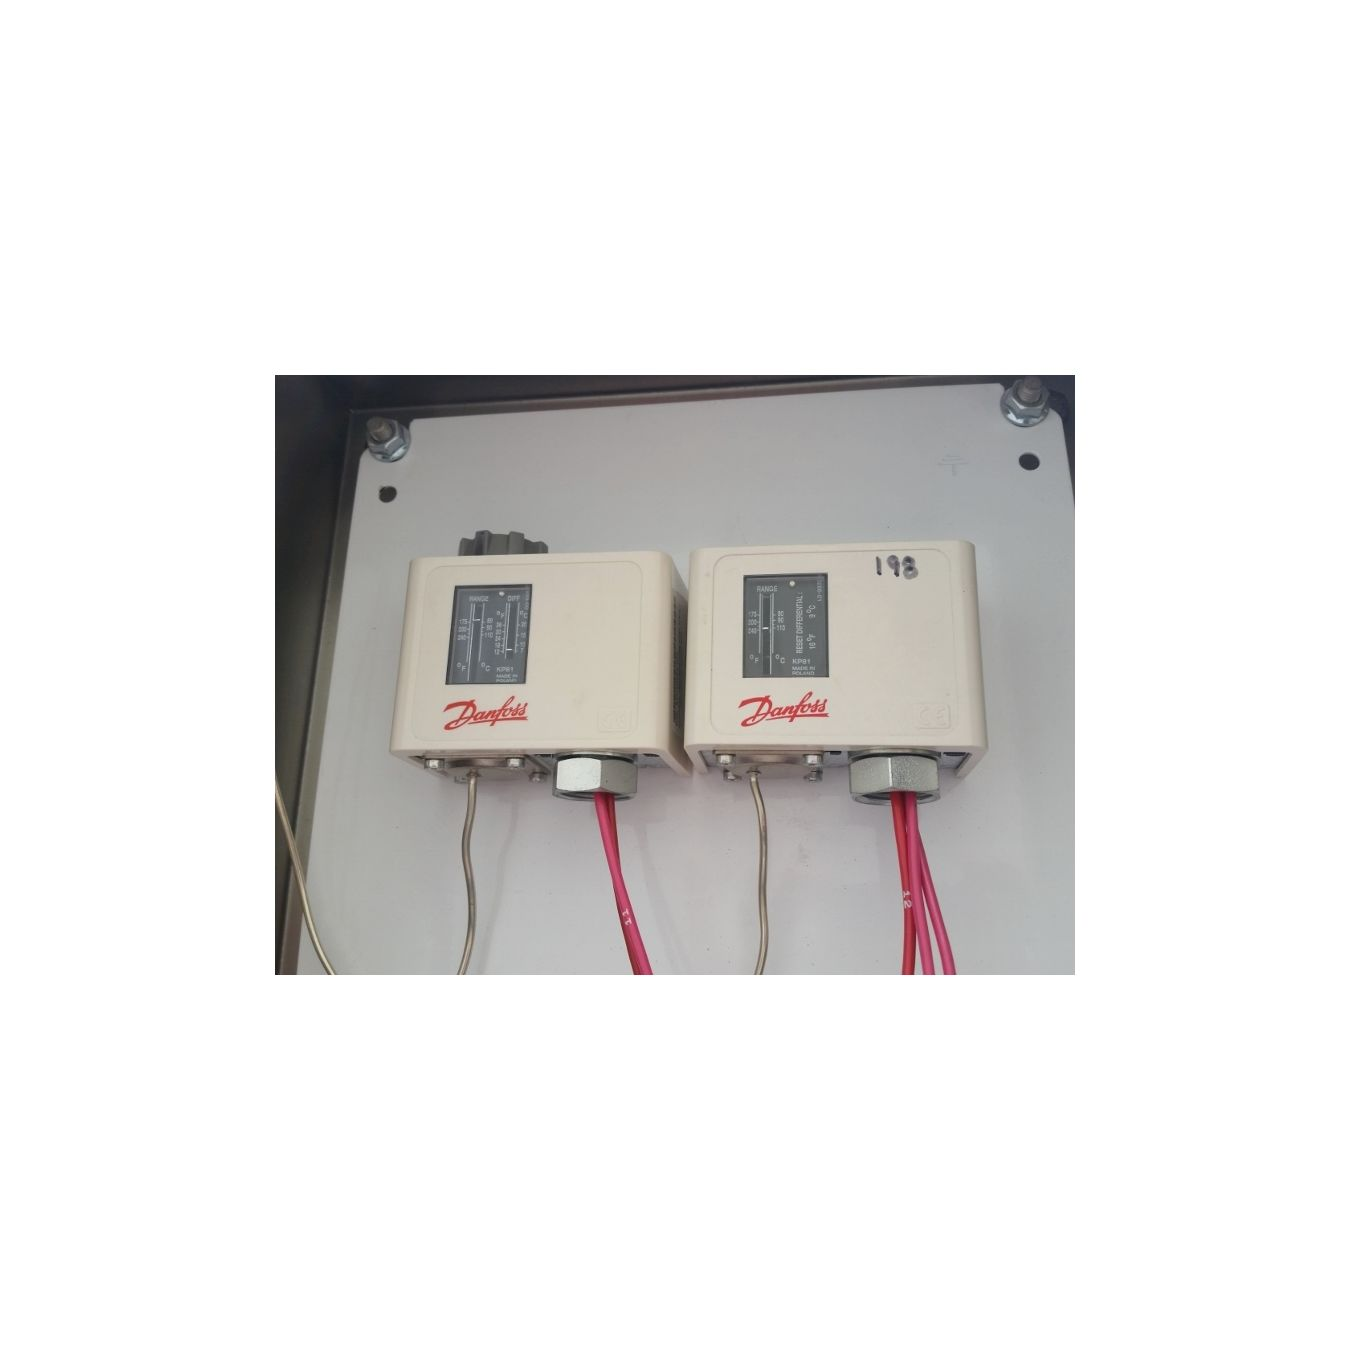 Cleaver Brooks Electric Boiler Wiring Diagram Electrical Used Cleaveru2010brooks Model Wbu2010120u201024kwu2010160hw Hot Water